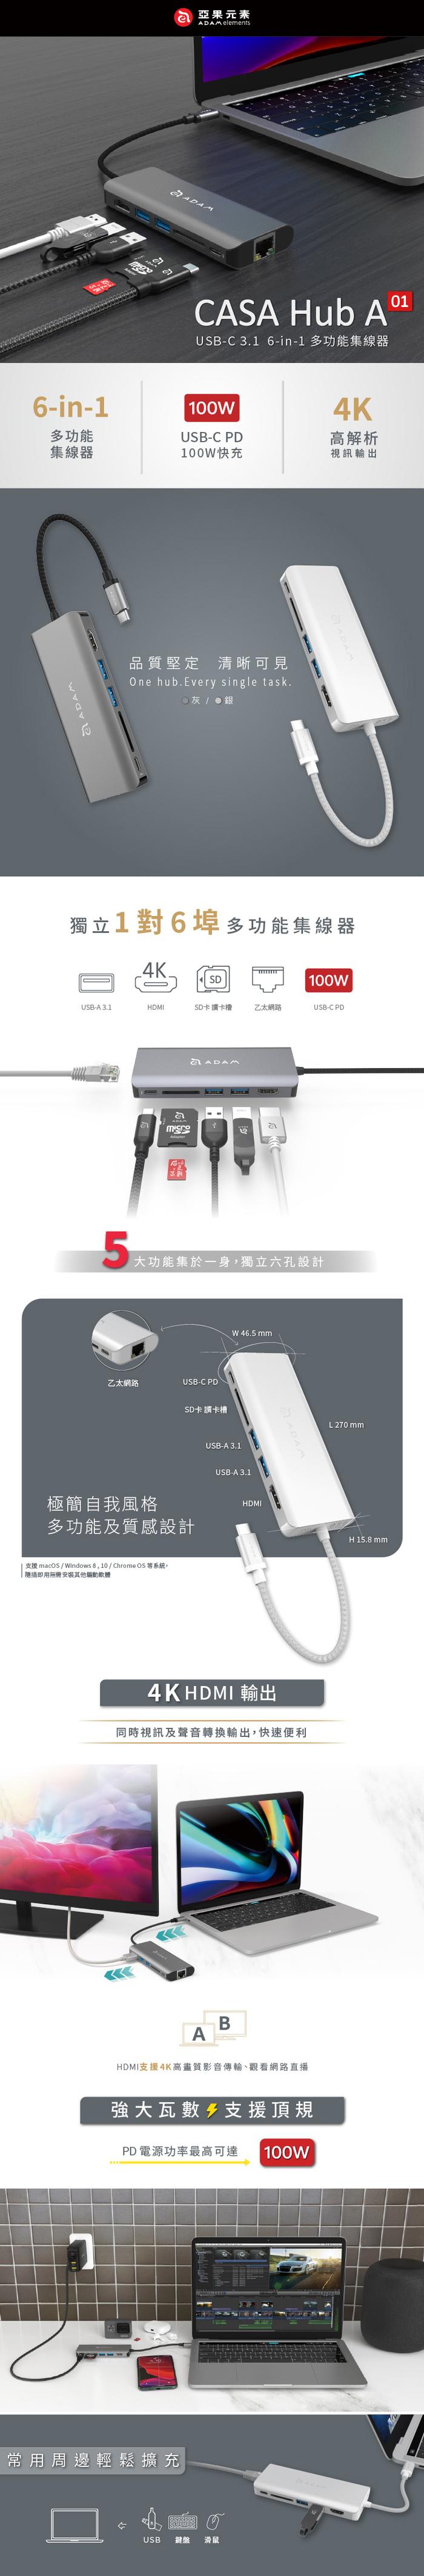 ADAM|Hub A01 USB-C 6 合 1 多功能轉接器